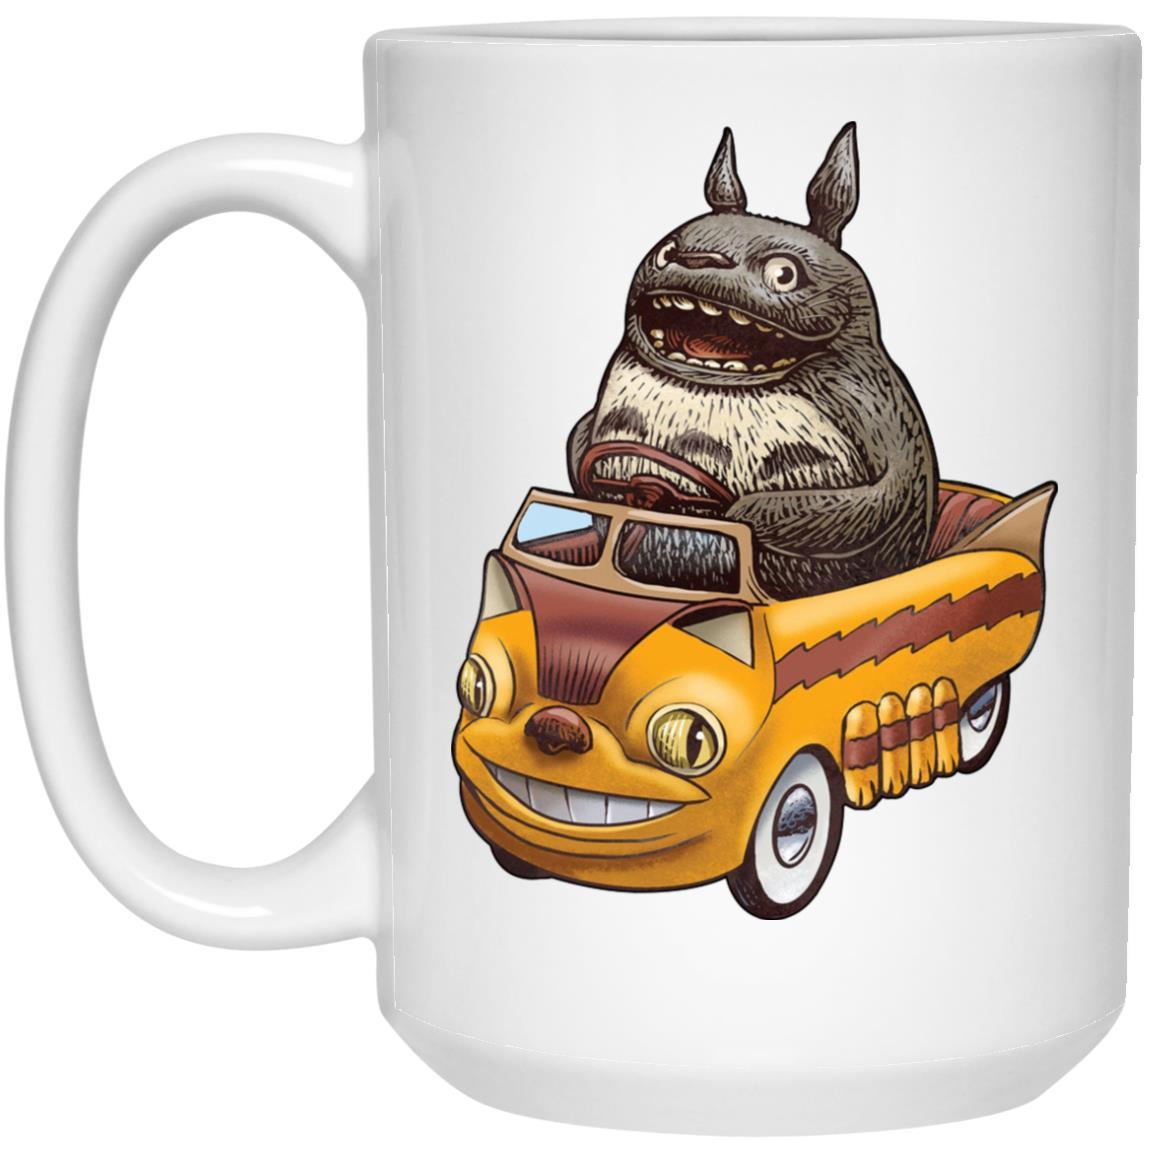 Totoro driving Catbus Mug